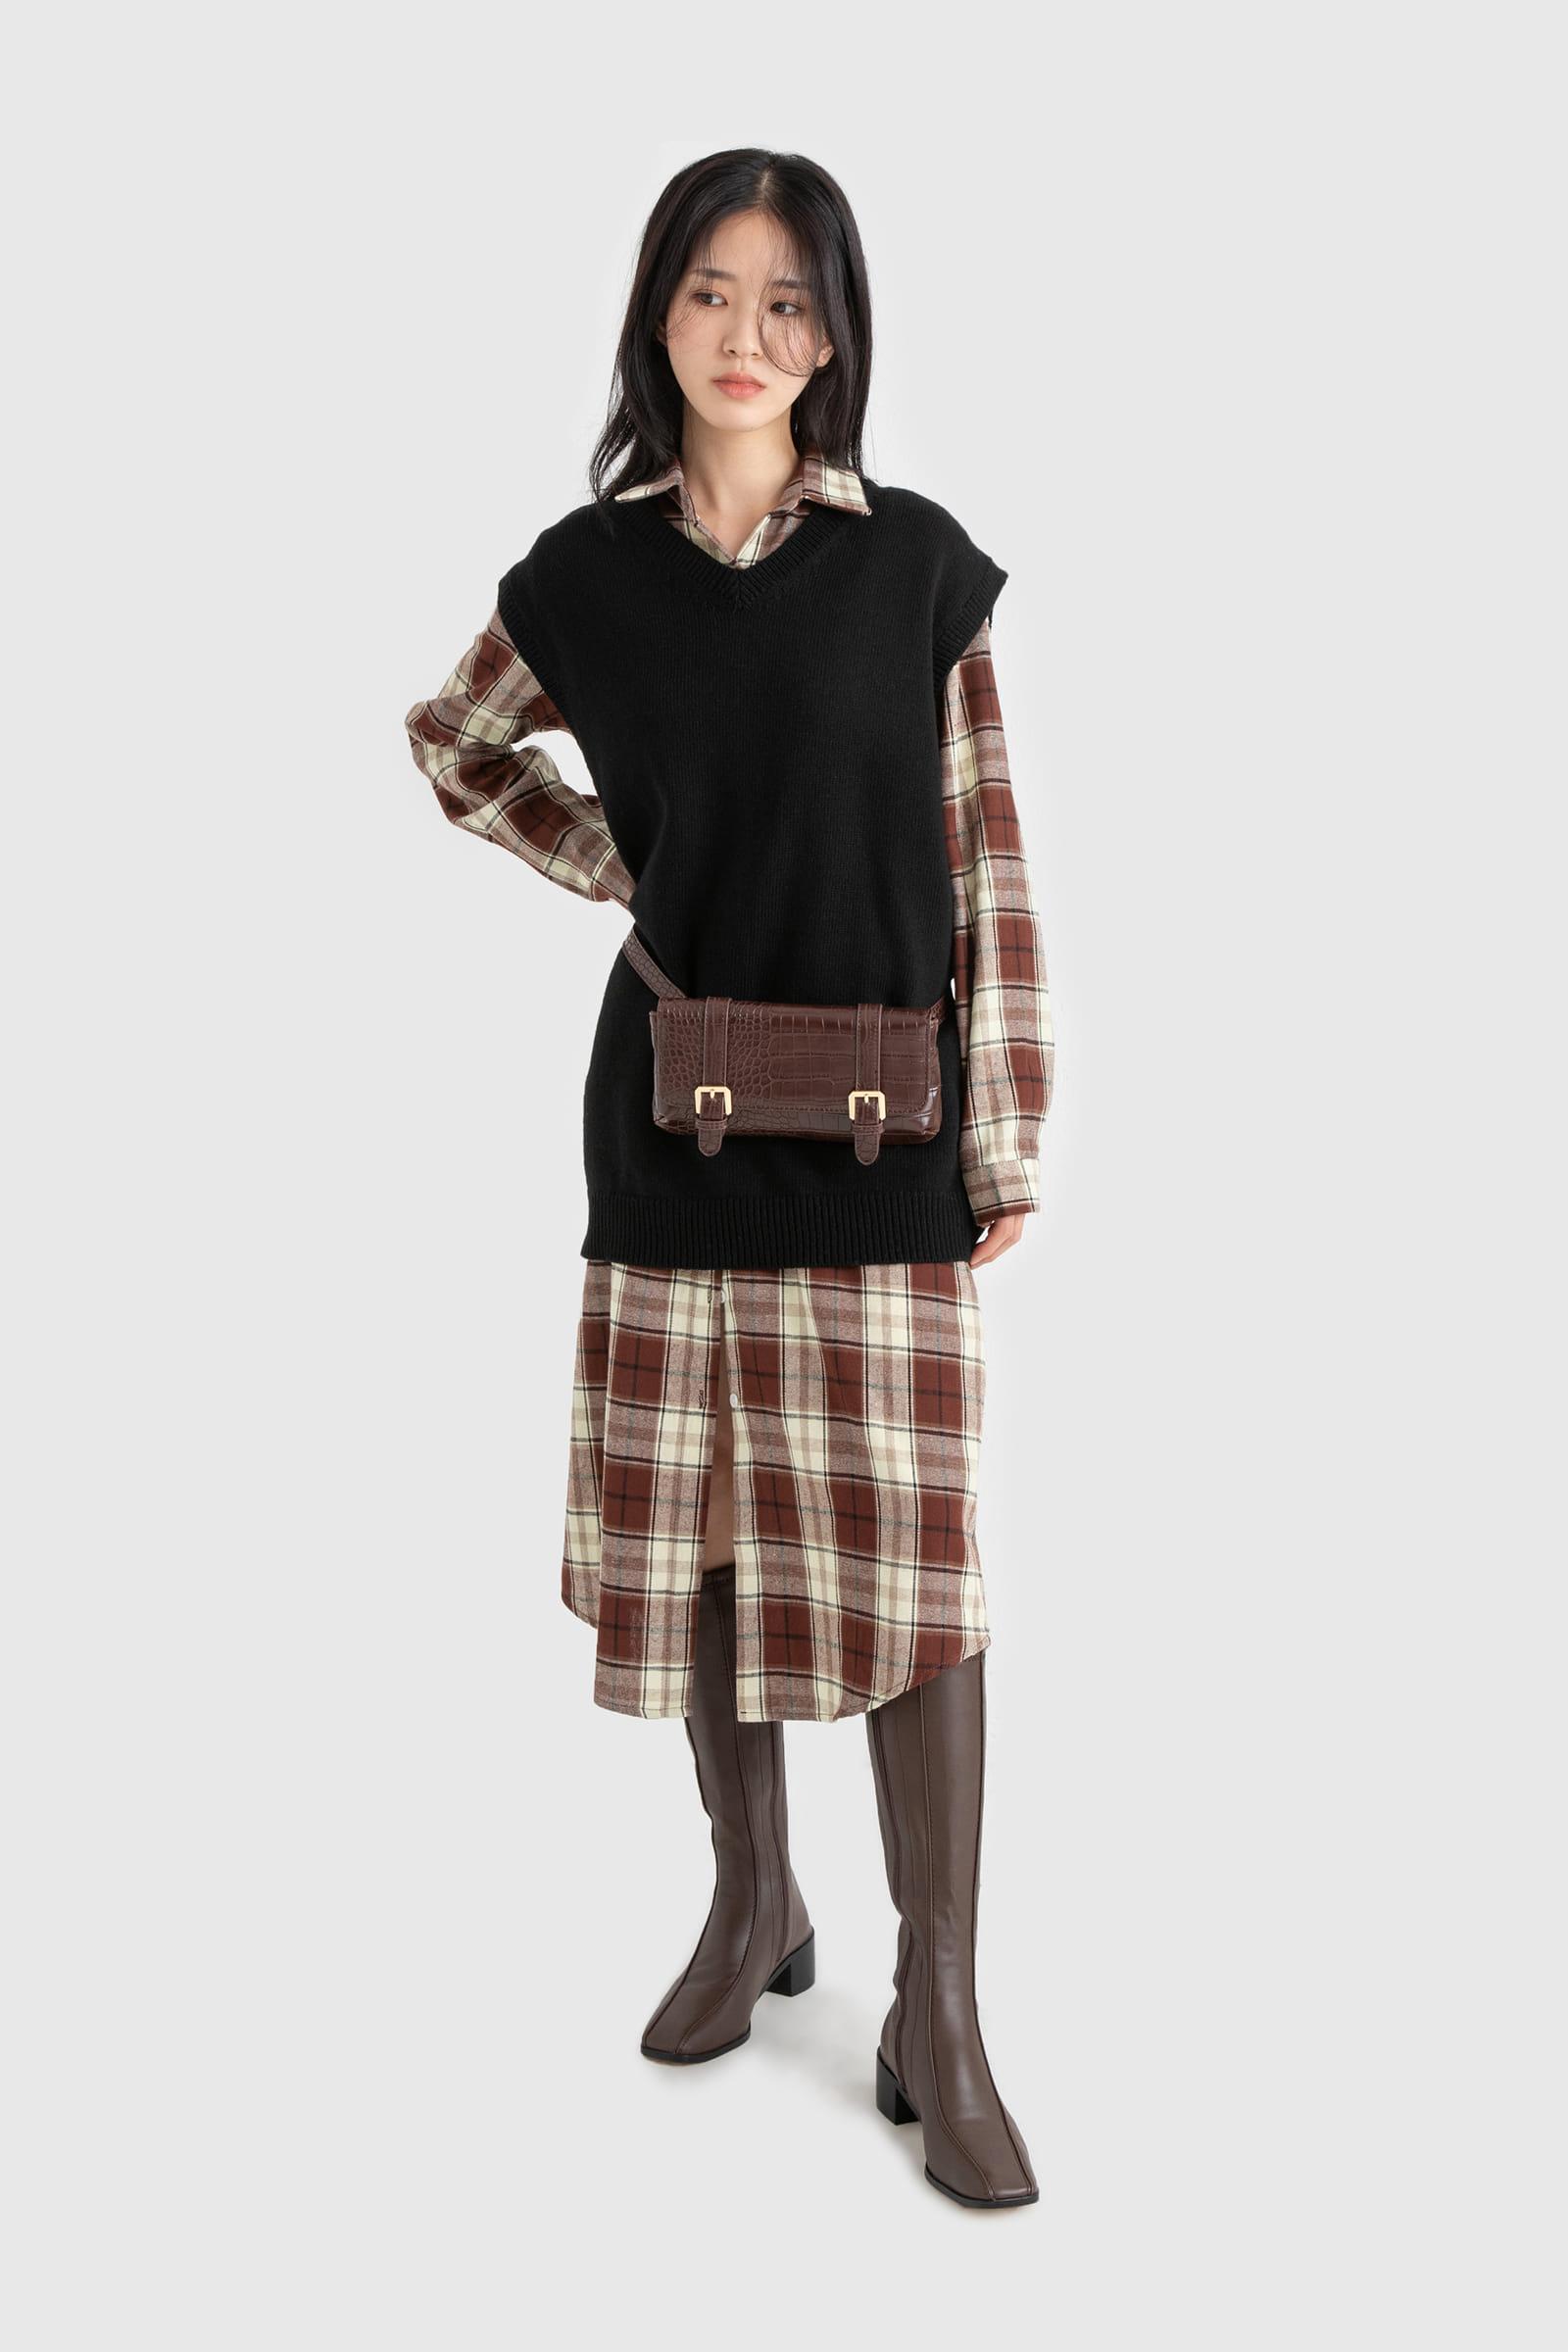 Unisex lambs wool V-neck knit best